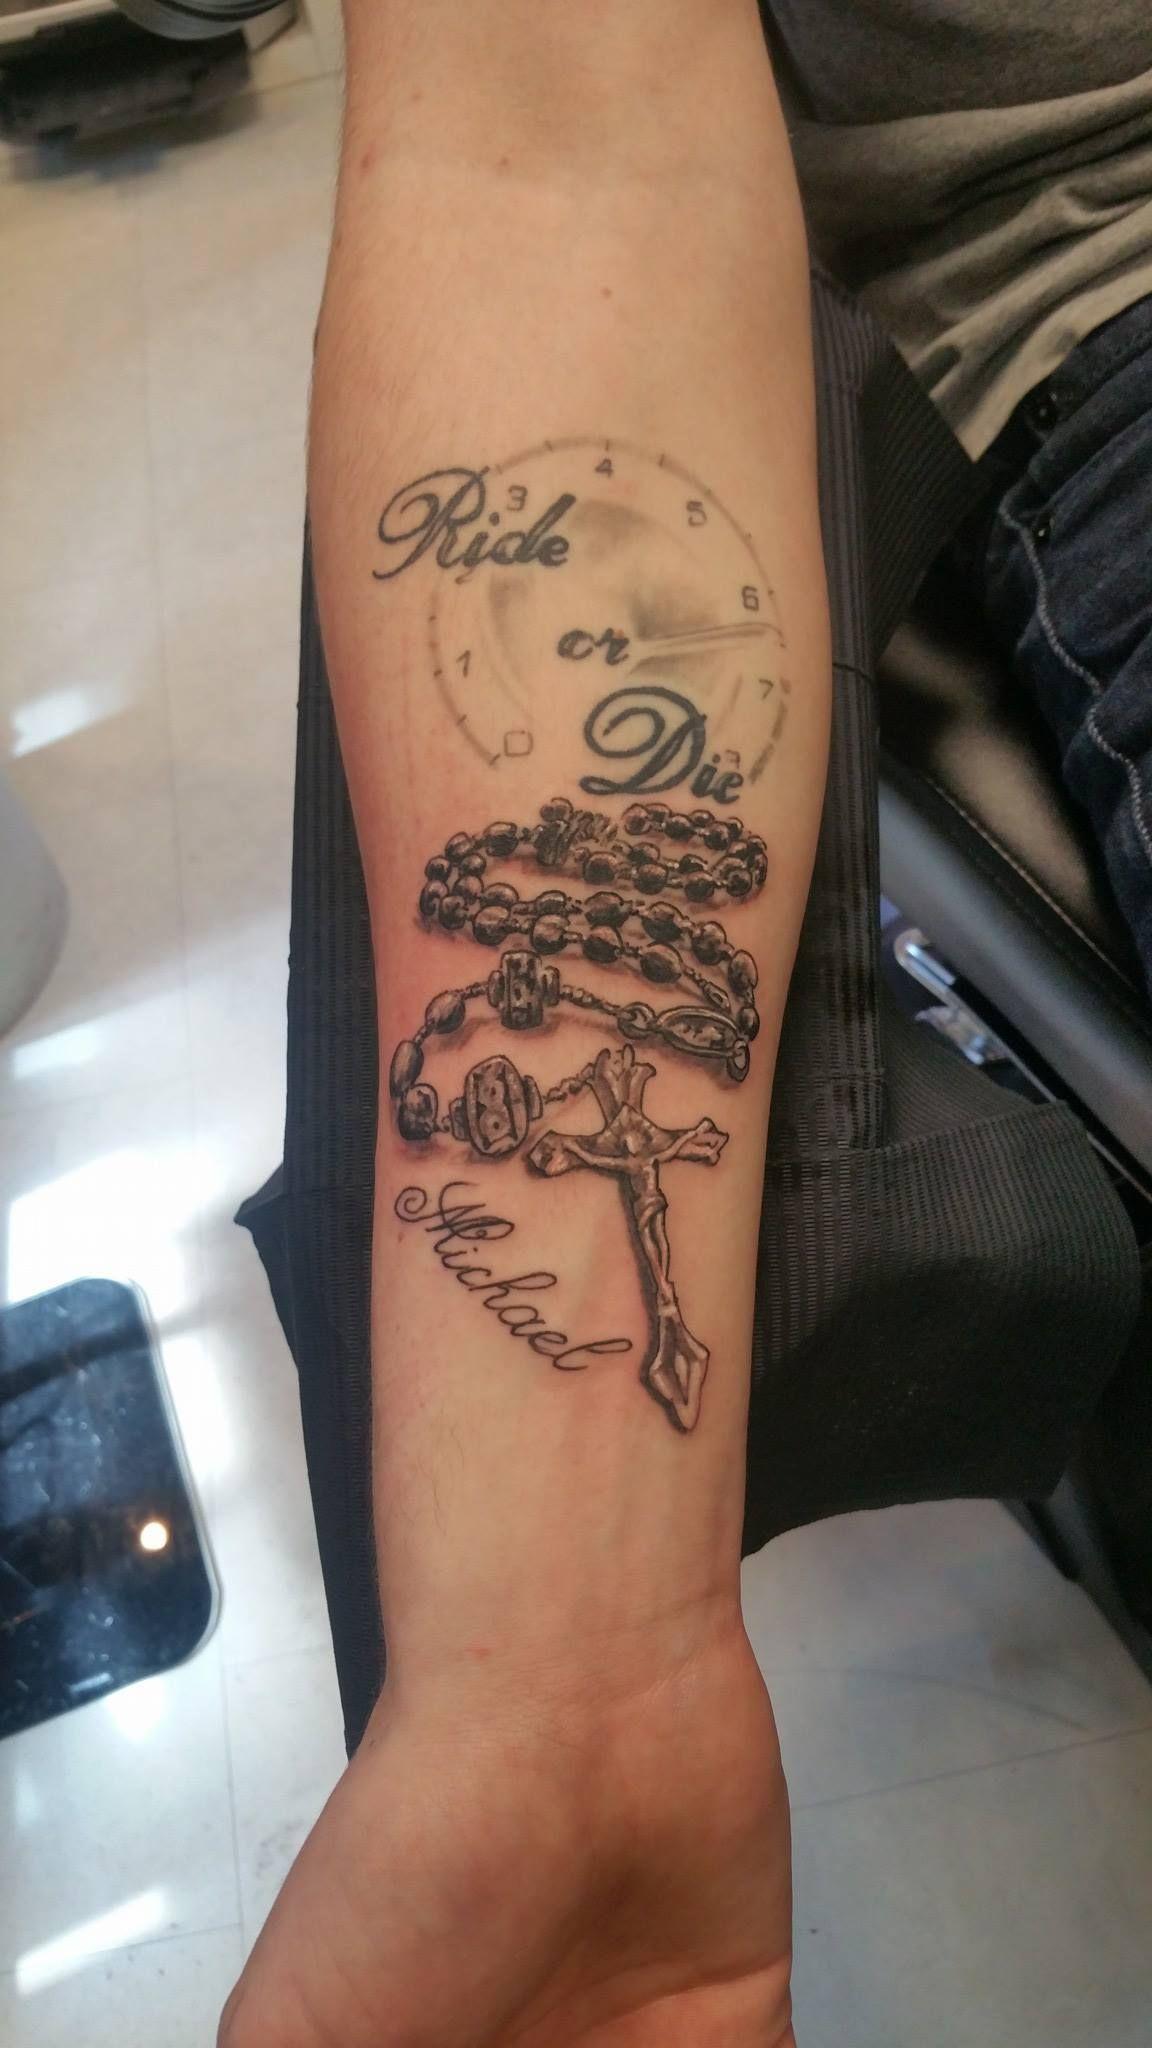 Rosary Bead Tattoo #rosarybeadtattoo Rosary bead tattoo Religious Tattoo  Memorial Tattoo #rosarybeadtattoo Rosary Bead Tattoo #rosarybeadtattoo Rosary bead tattoo Religious Tattoo  Memorial Tattoo #rosarybeadtattoo Rosary Bead Tattoo #rosarybeadtattoo Rosary bead tattoo Religious Tattoo  Memorial Tattoo #rosarybeadtattoo Rosary Bead Tattoo #rosarybeadtattoo Rosary bead tattoo Religious Tattoo  Memorial Tattoo #rosarybeadtattoo